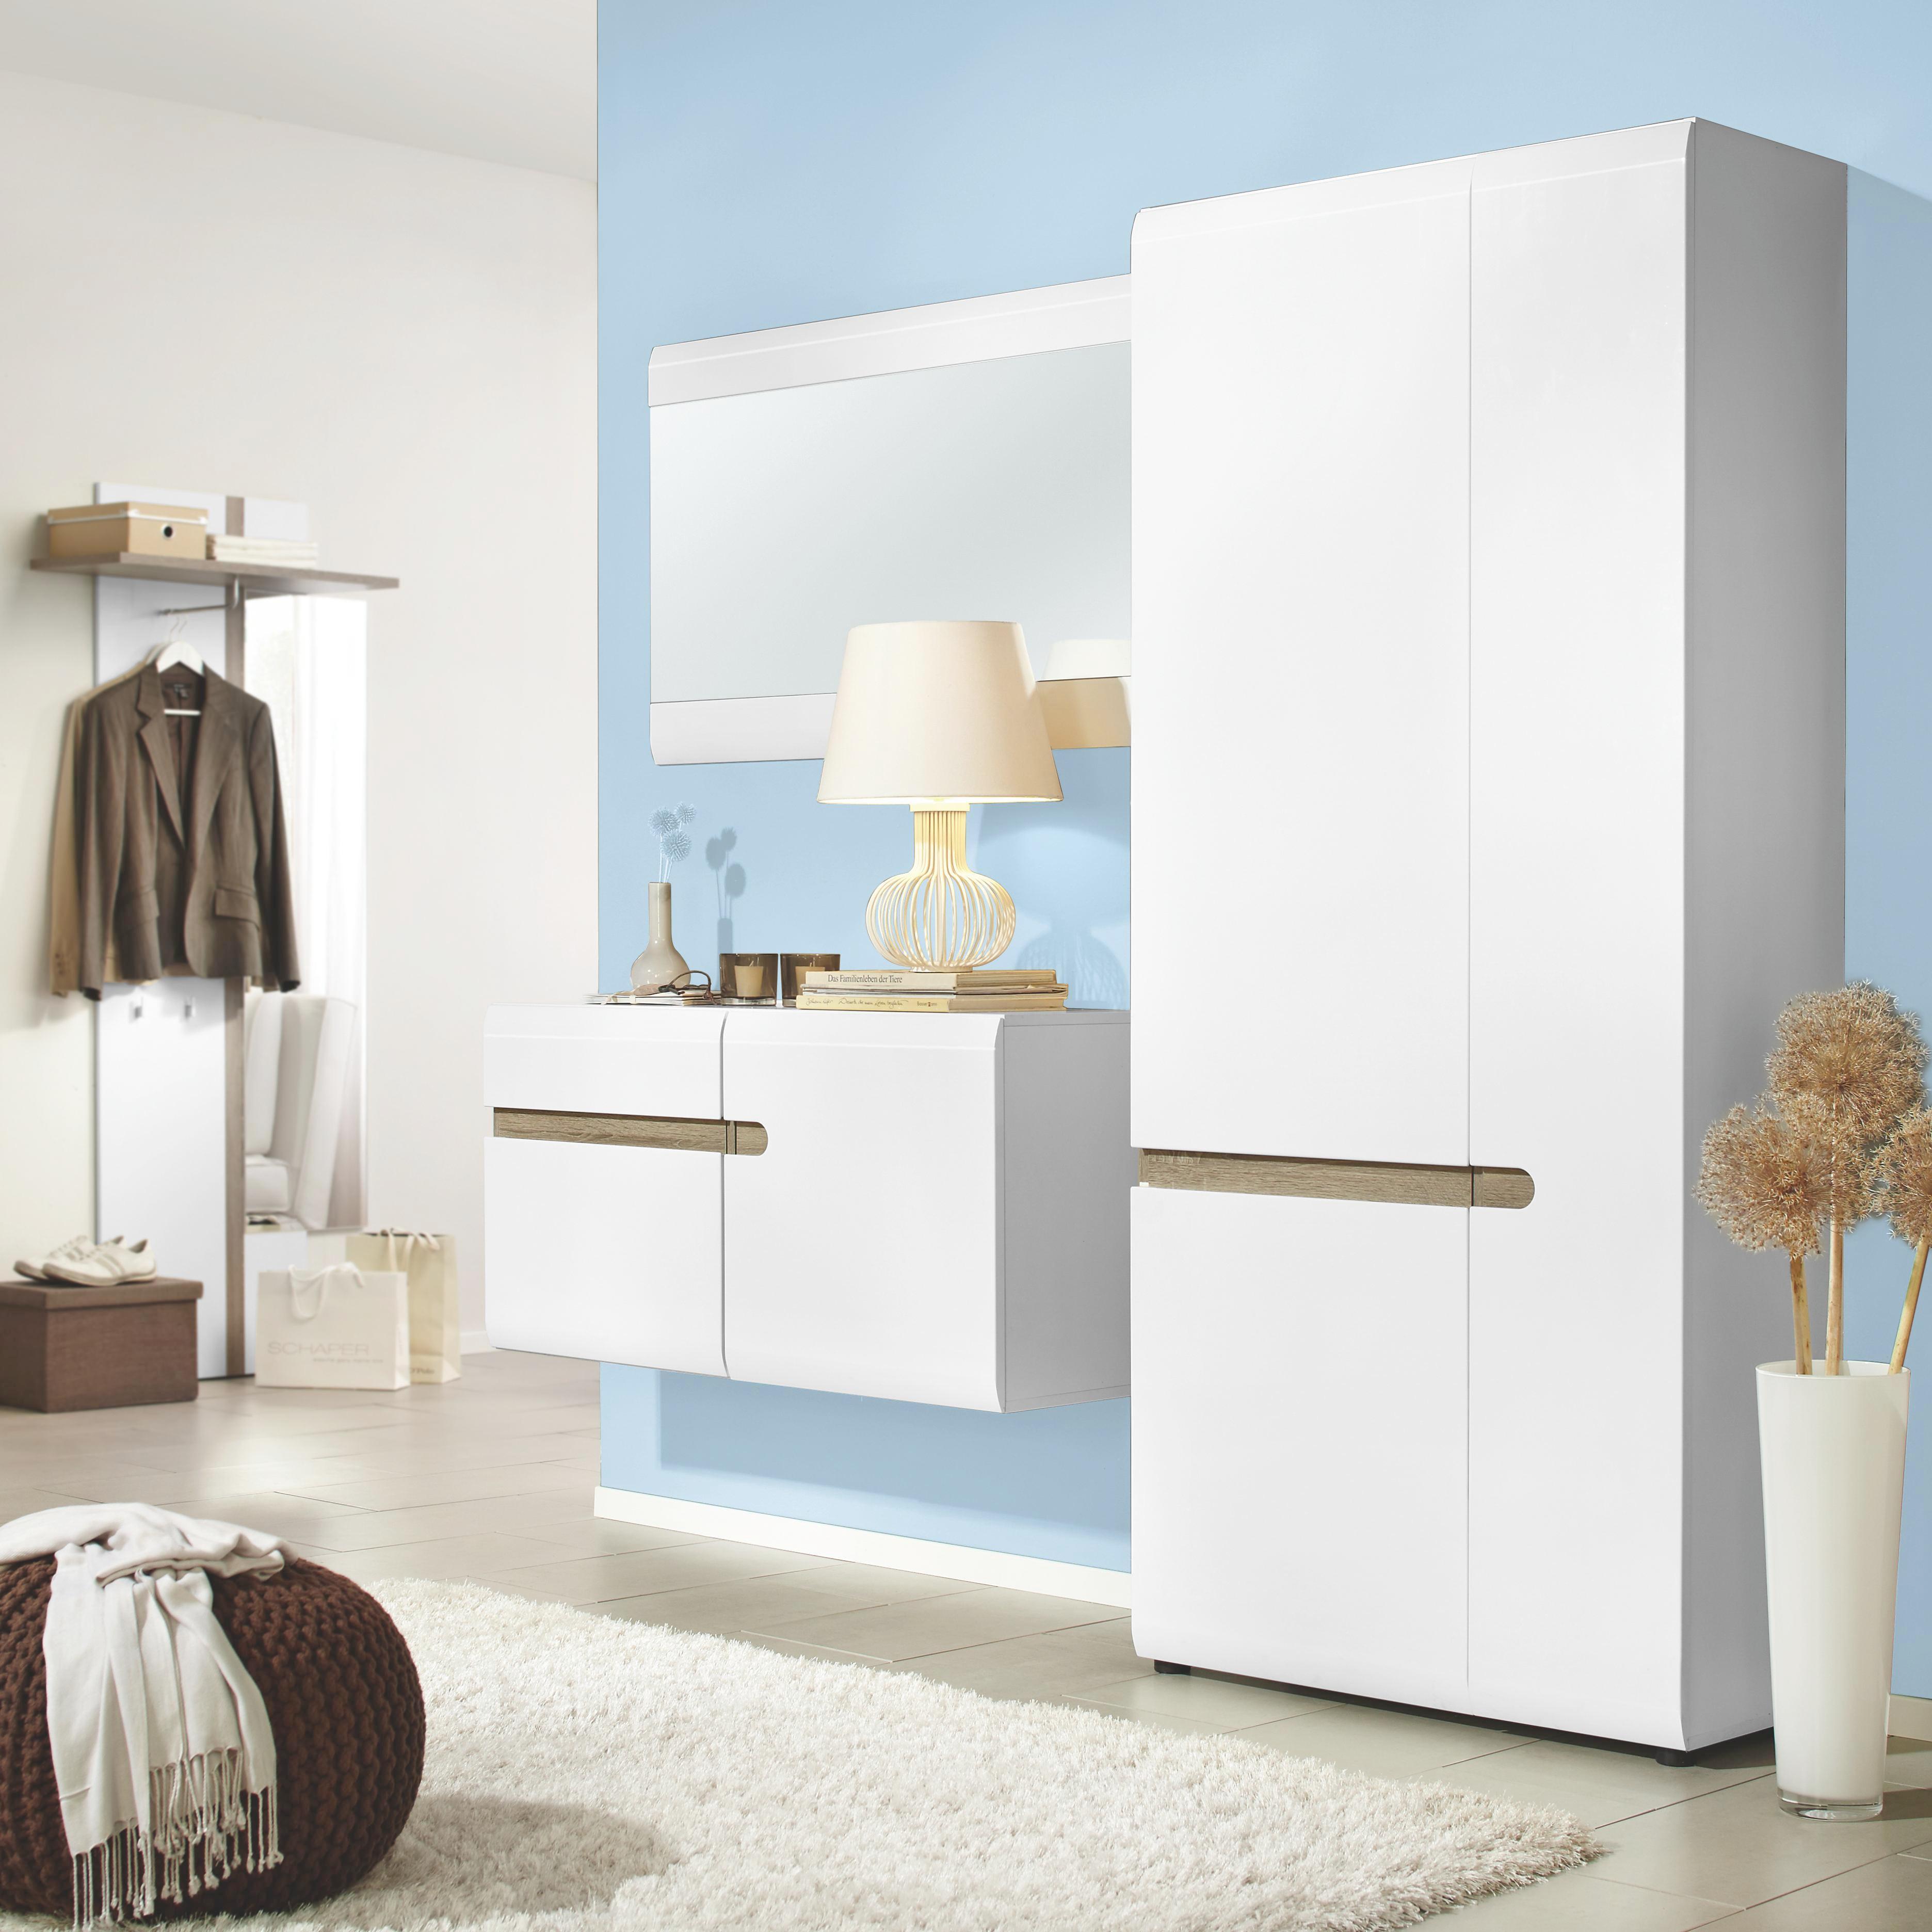 Moderne Garderobenschränke berühmt moderne garderobenschränke galerie die designideen für